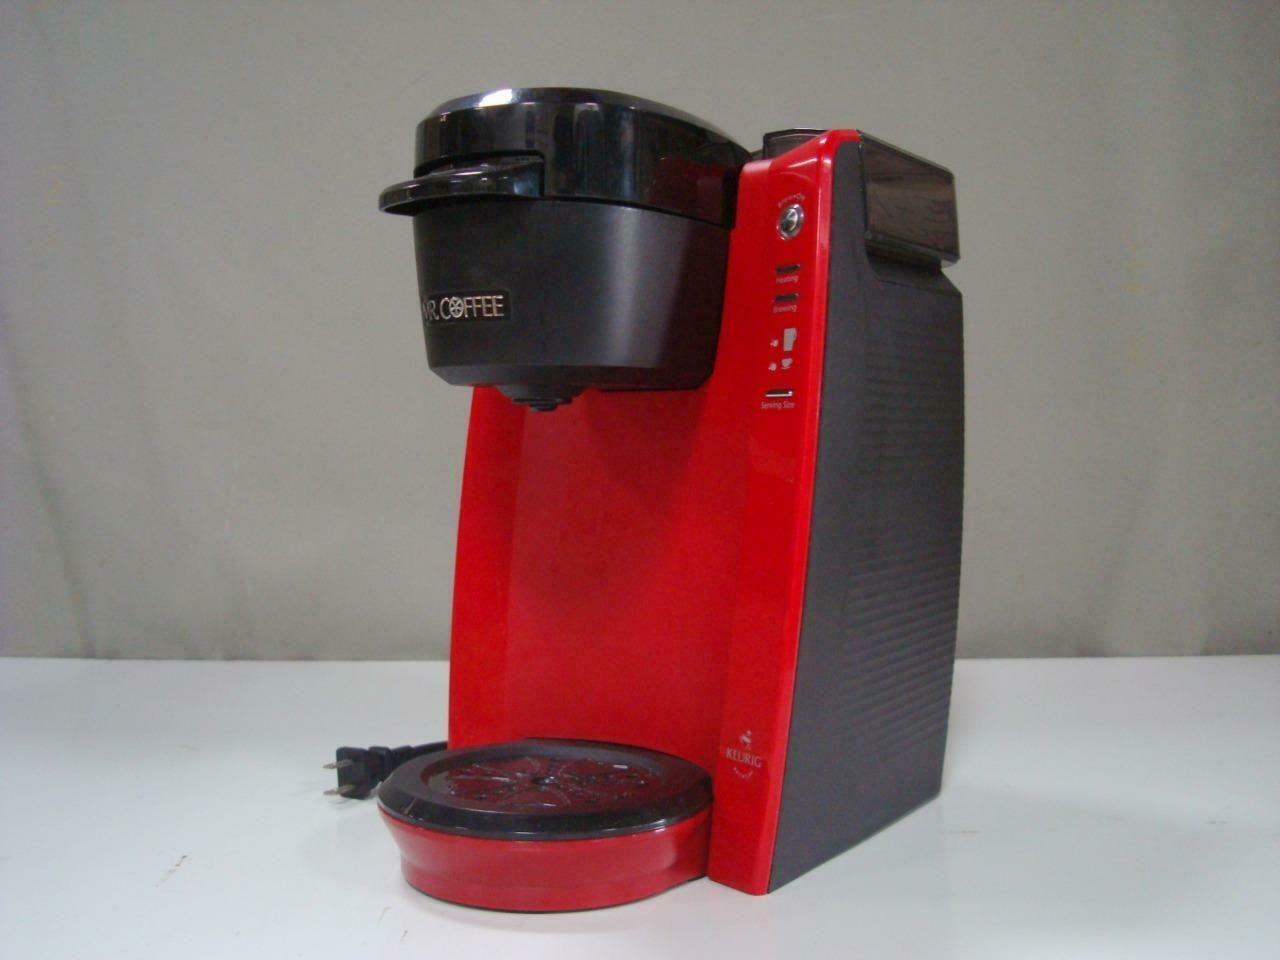 Details About Red Mr Coffee Keurig Brewed Single Cup Coffee Maker